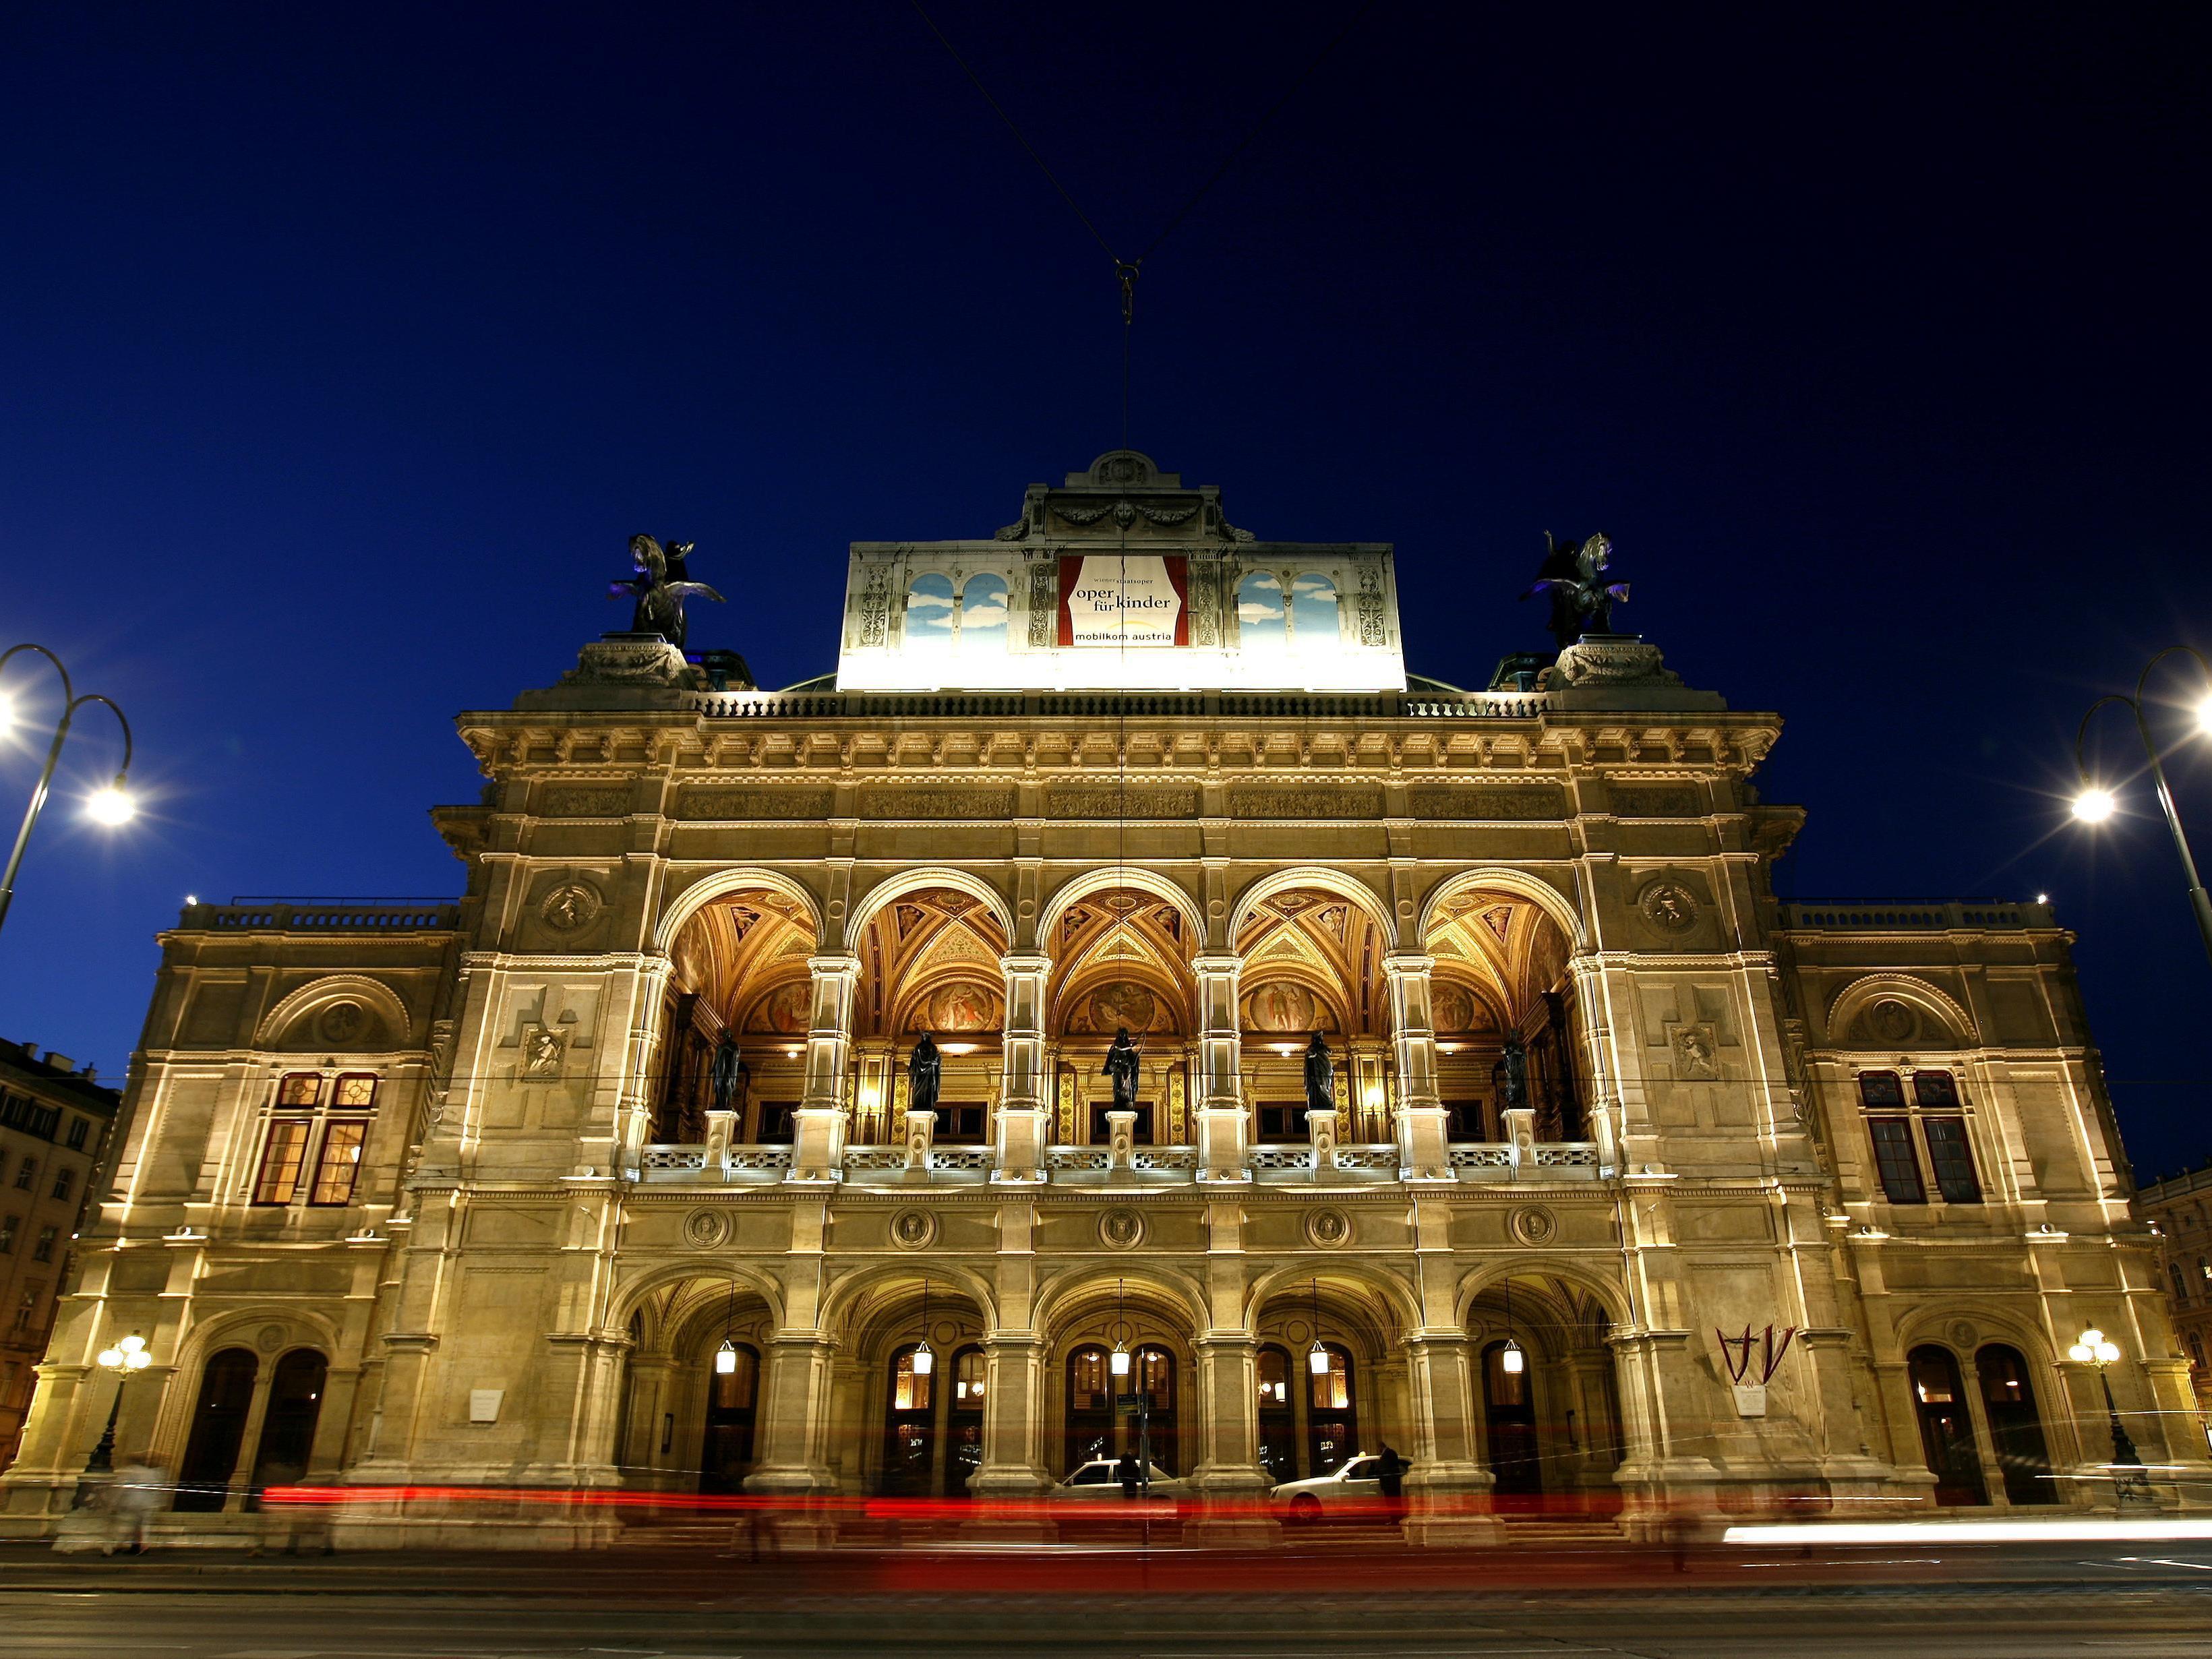 Die Wiener Staatsoper bei Nacht.